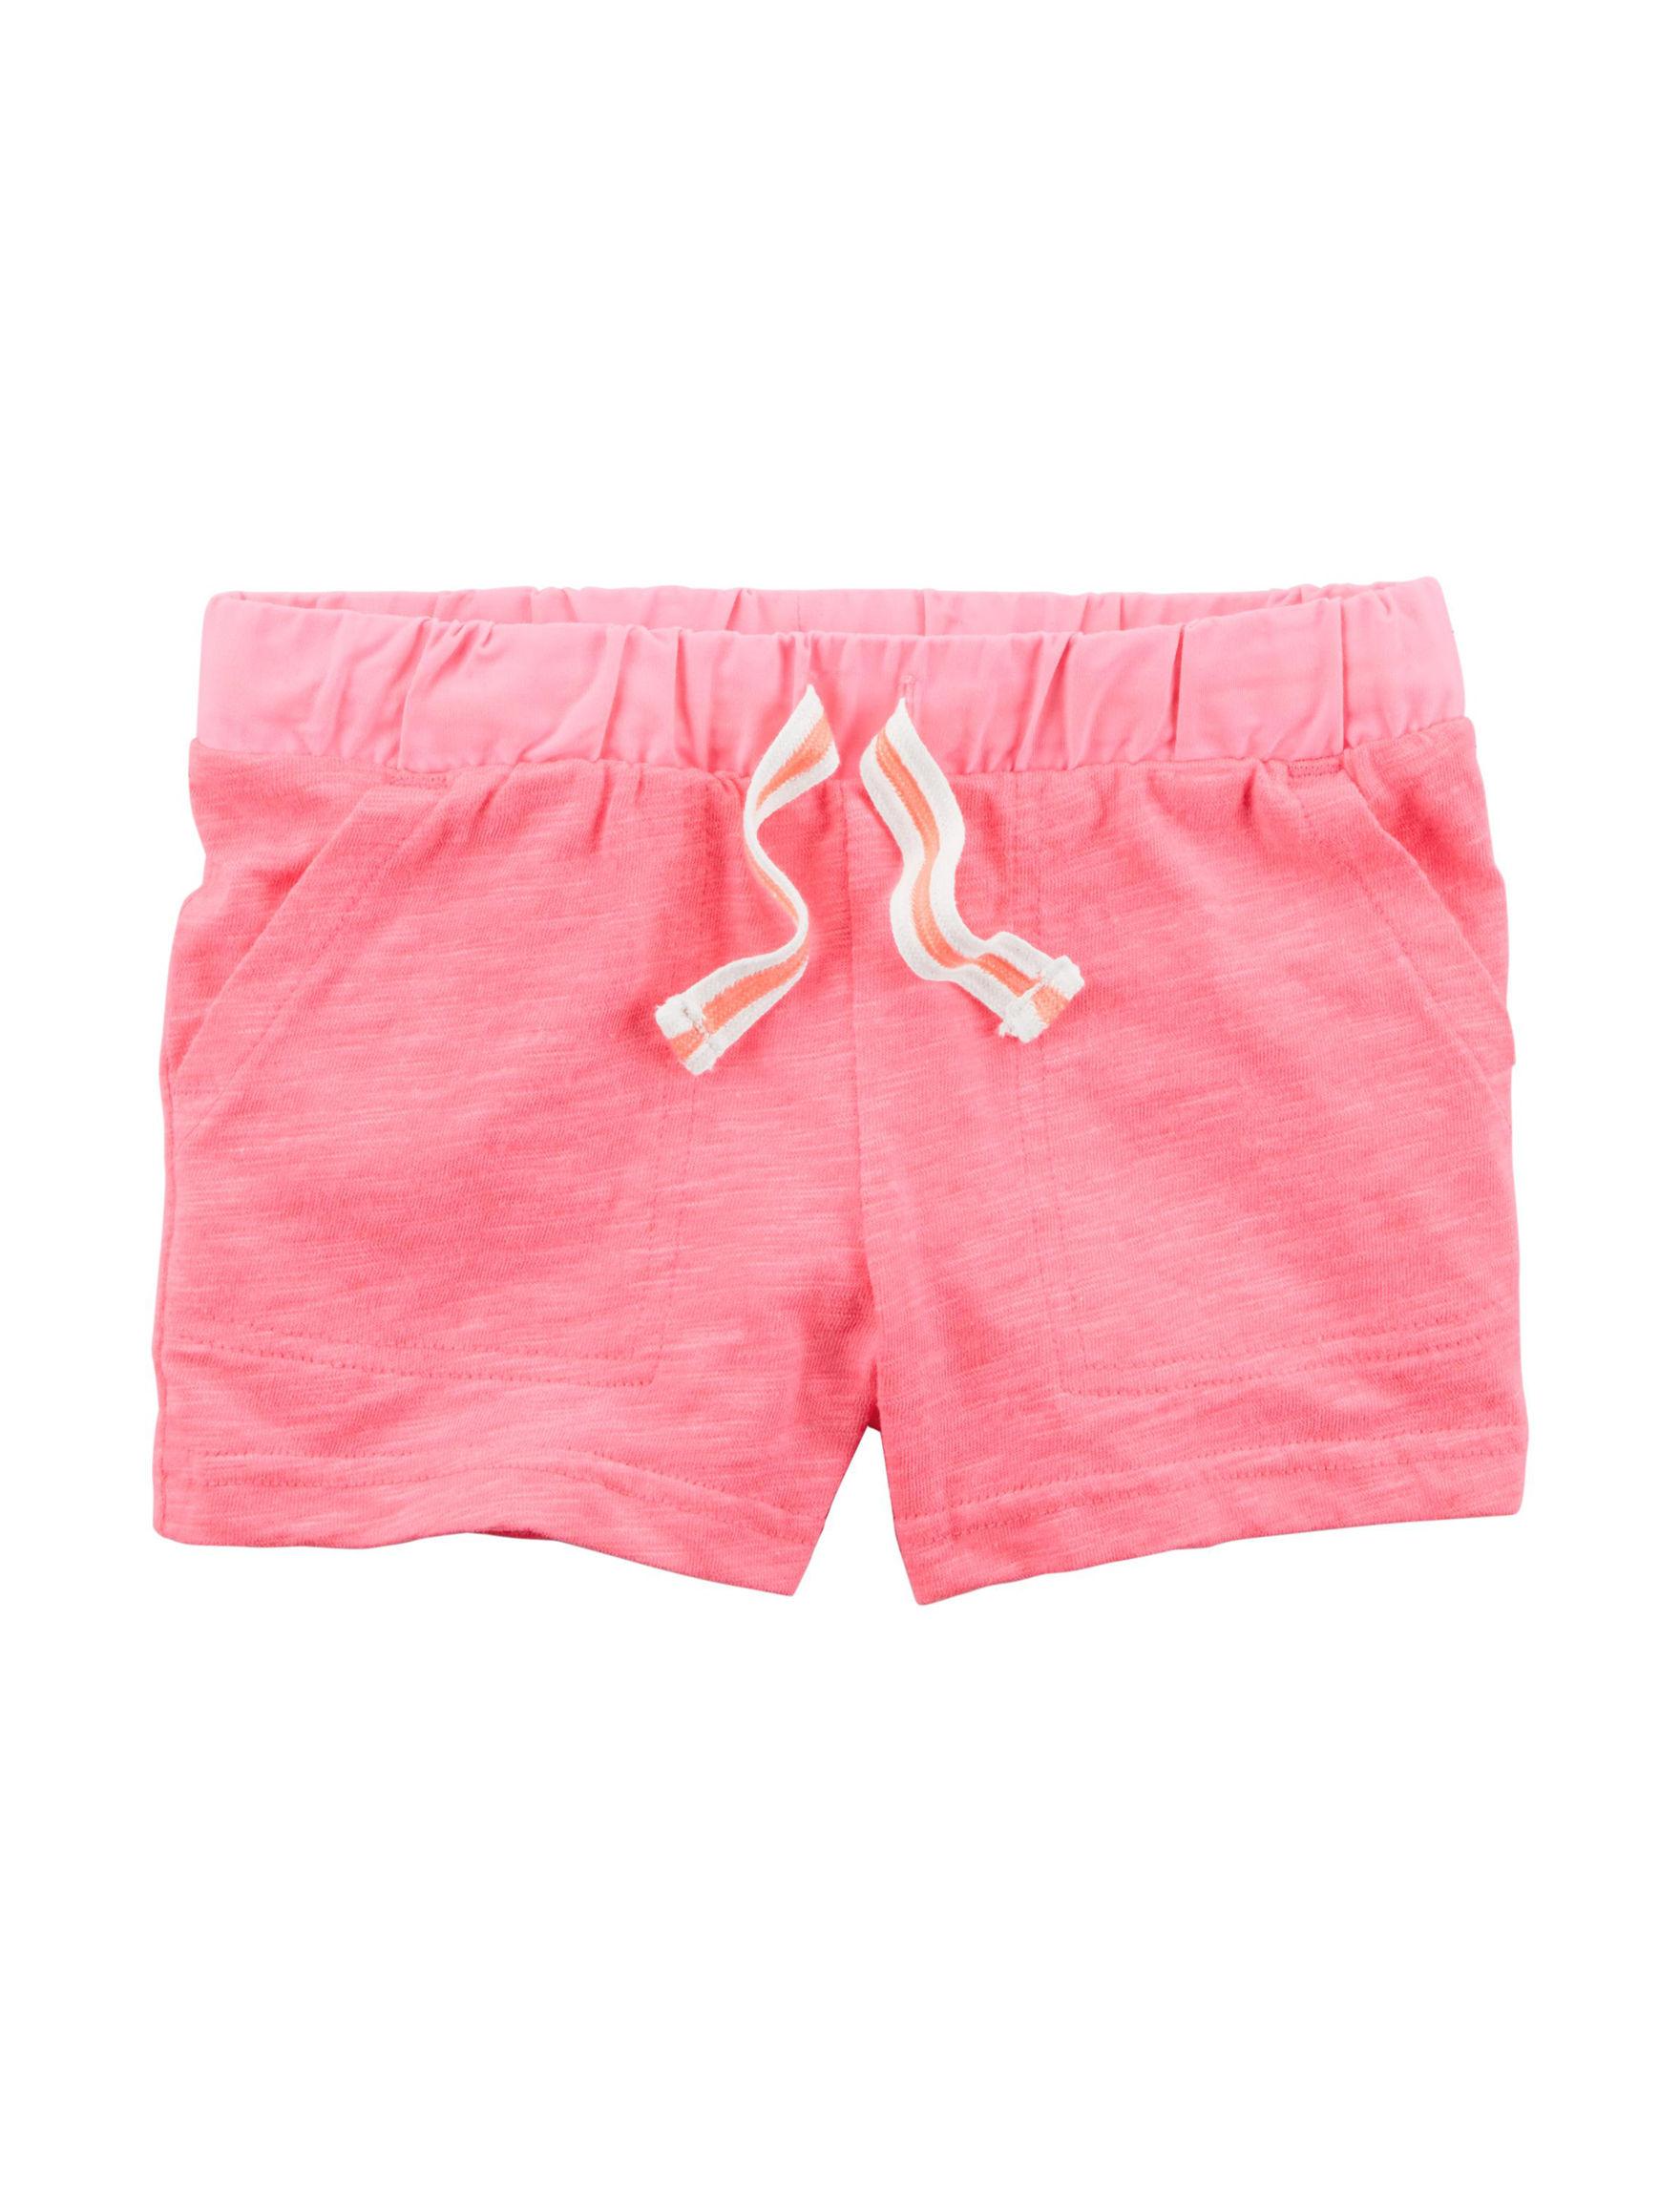 Carter's Pink Soft Shorts